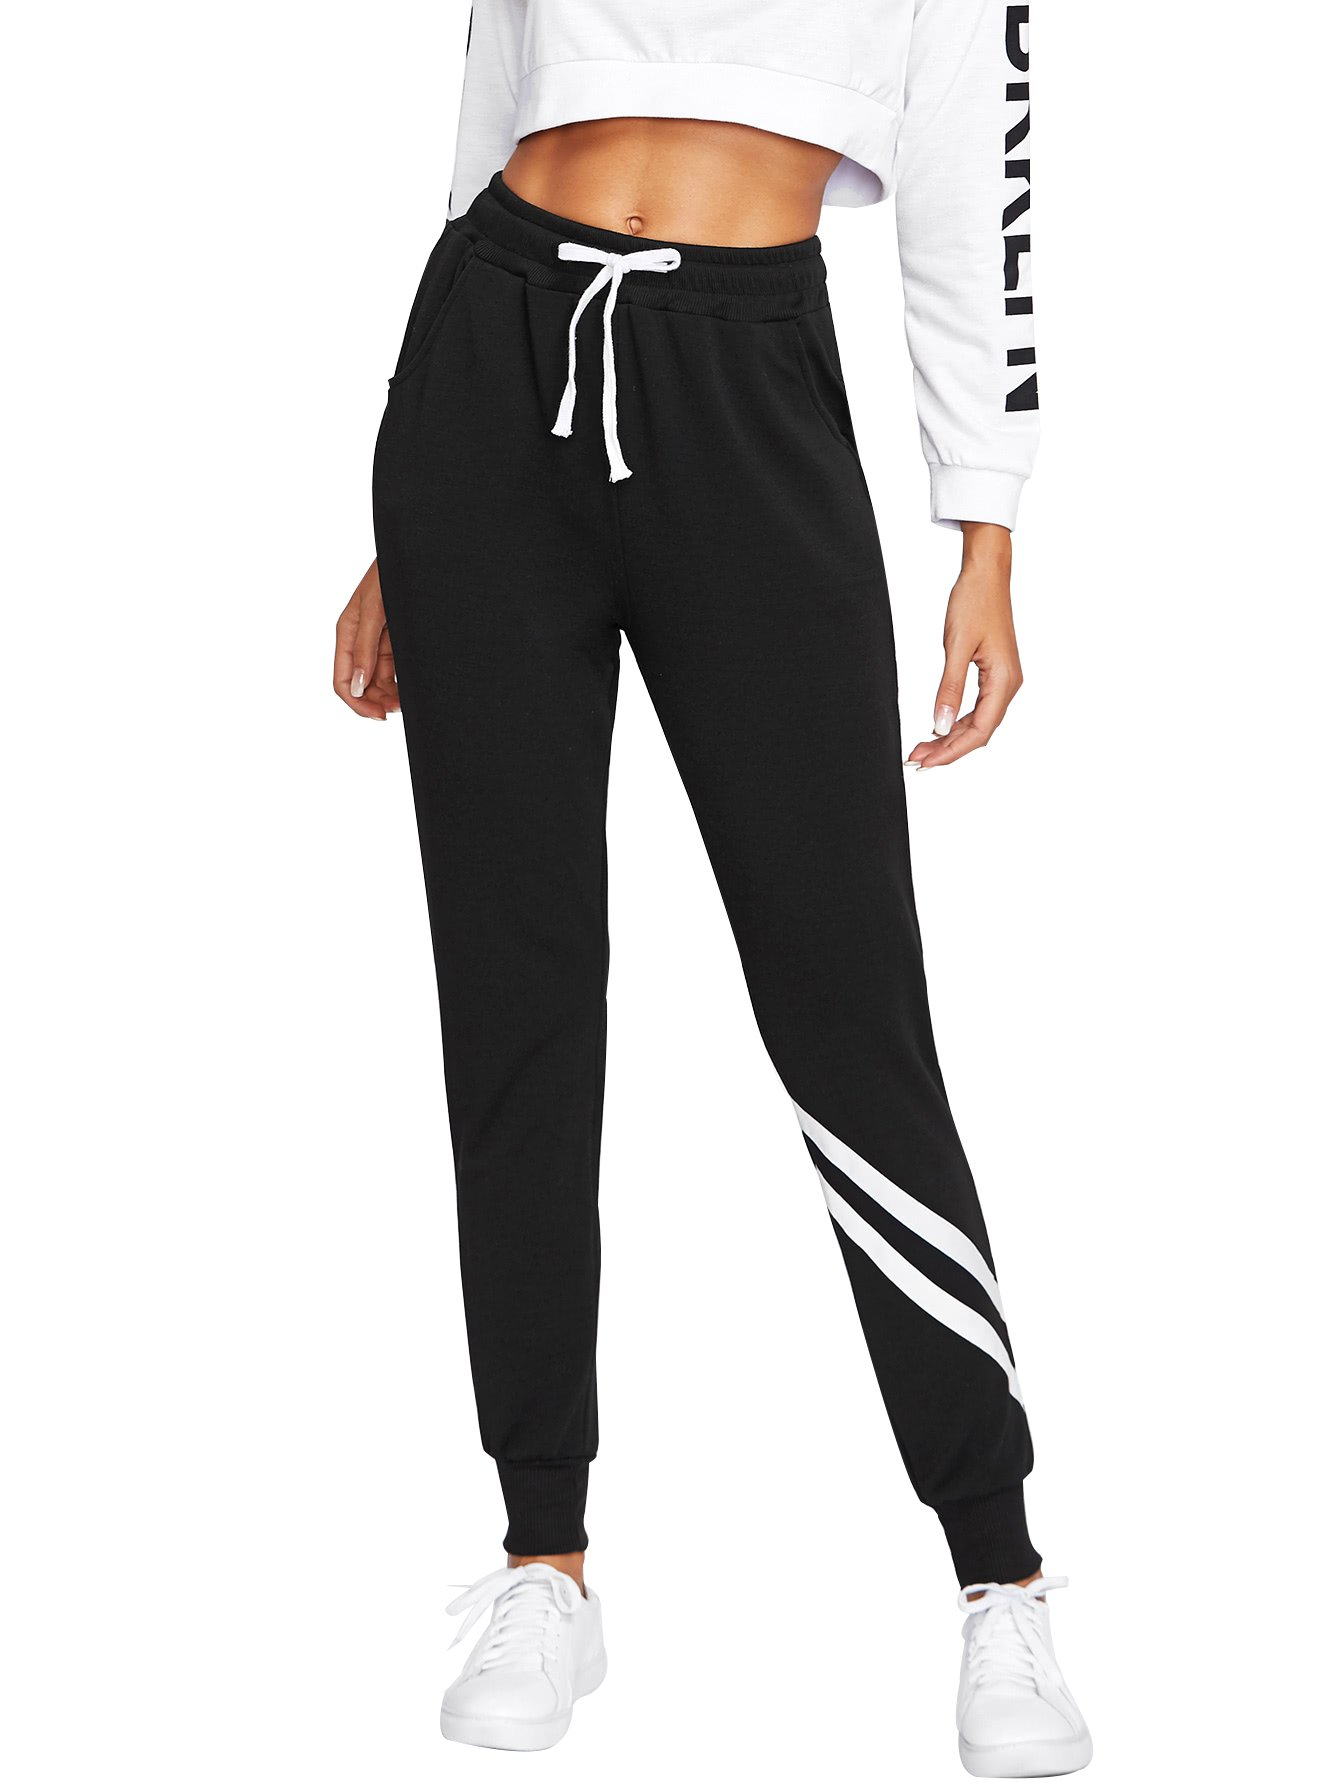 SweatyRocks Women Pants Color block Casual Tie Waist Yoga Jogger Pants Black S